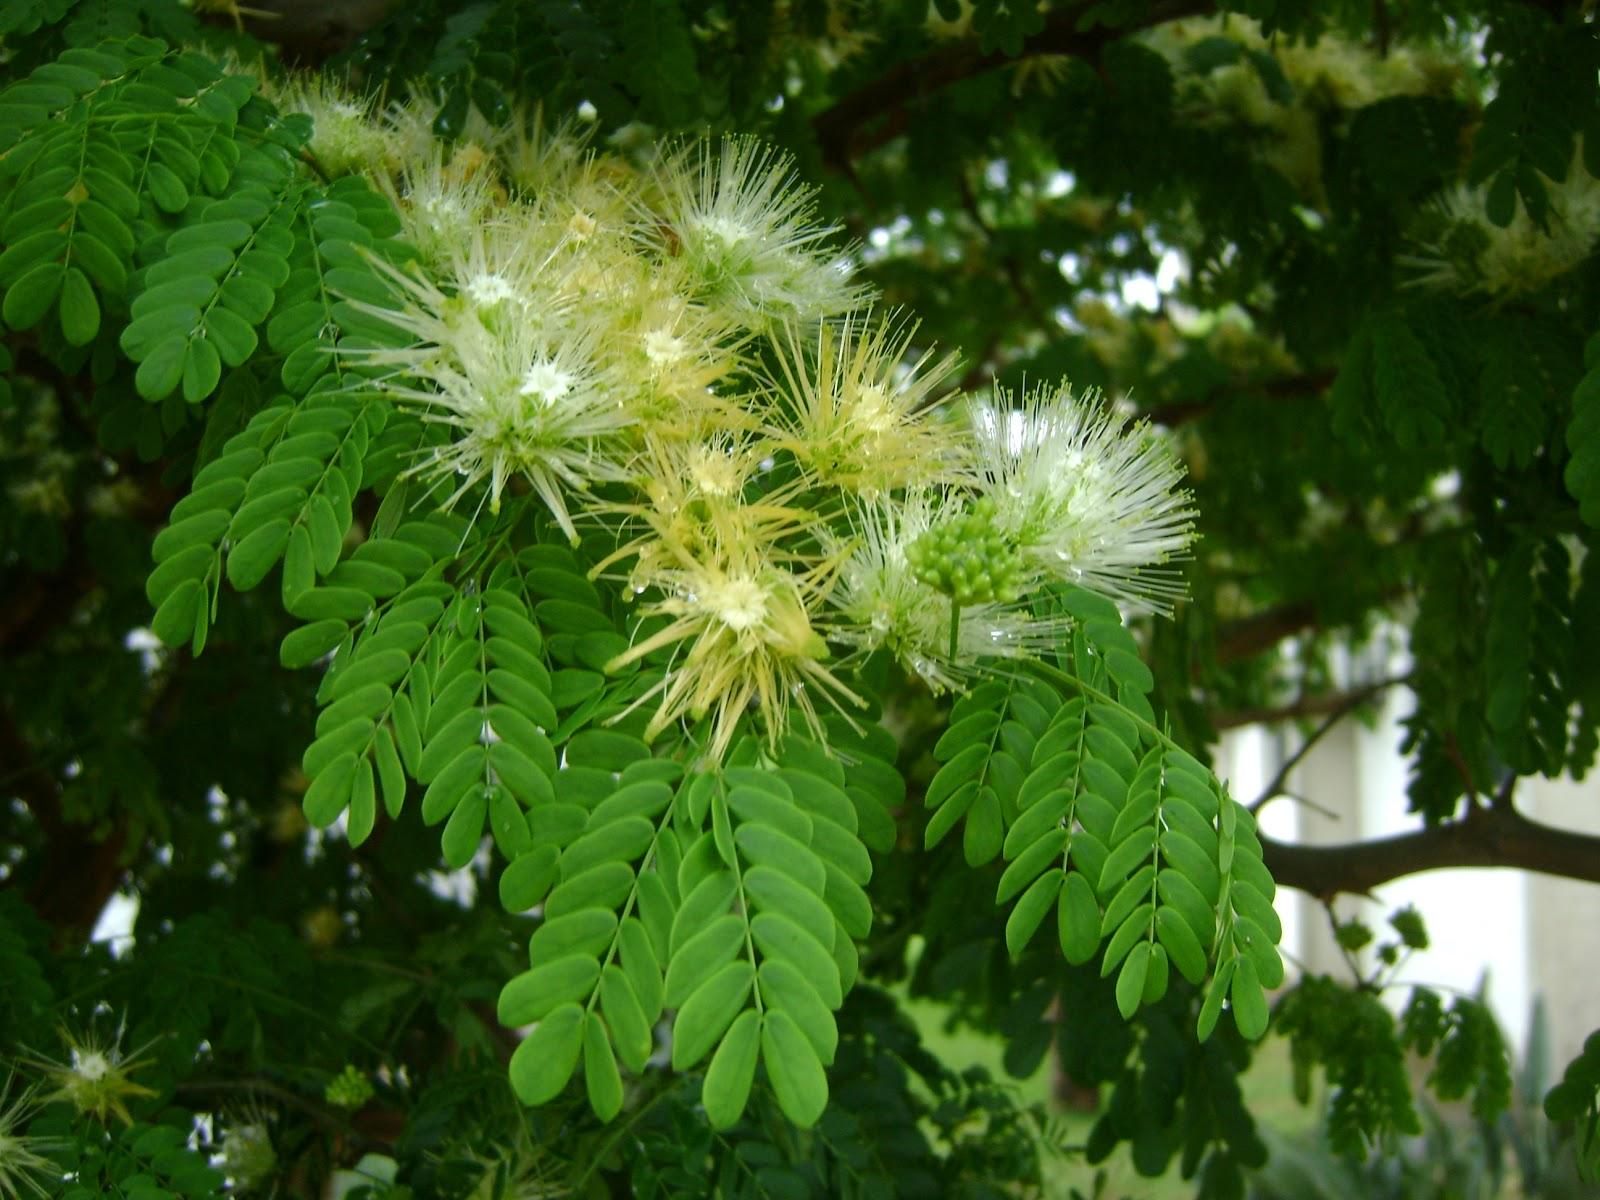 The Flowering plants  Leguminosae  Fabaceae Fabaceae  Chloroleucon